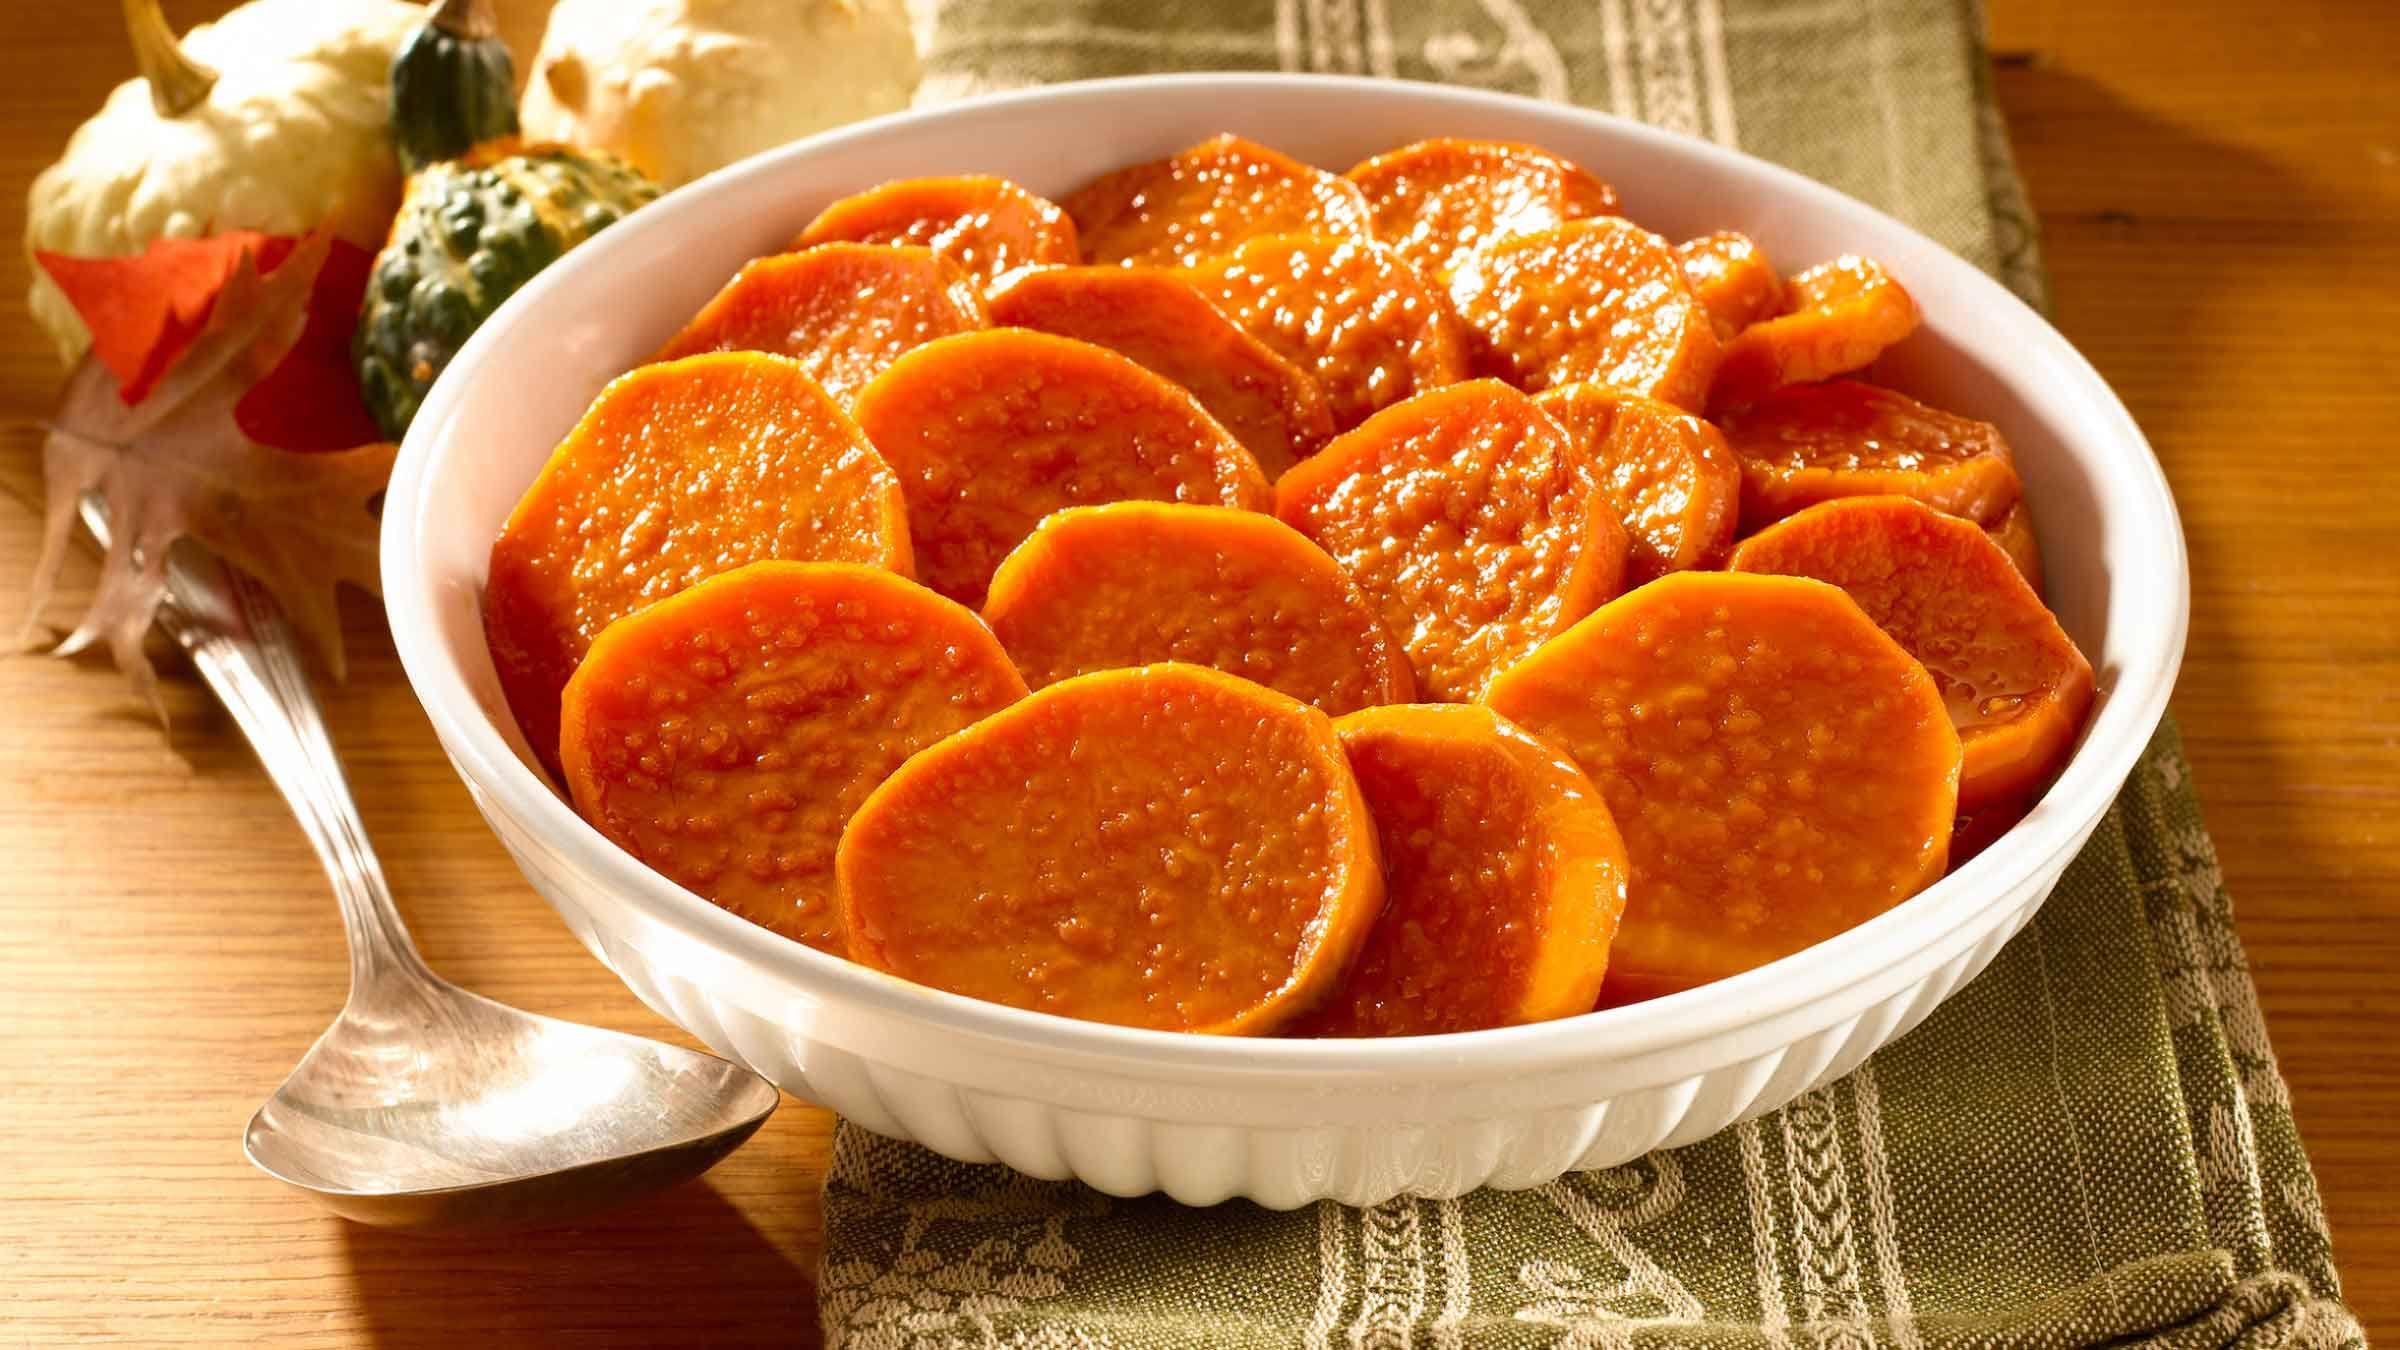 Honey-Glazed Sweet Potato Bake